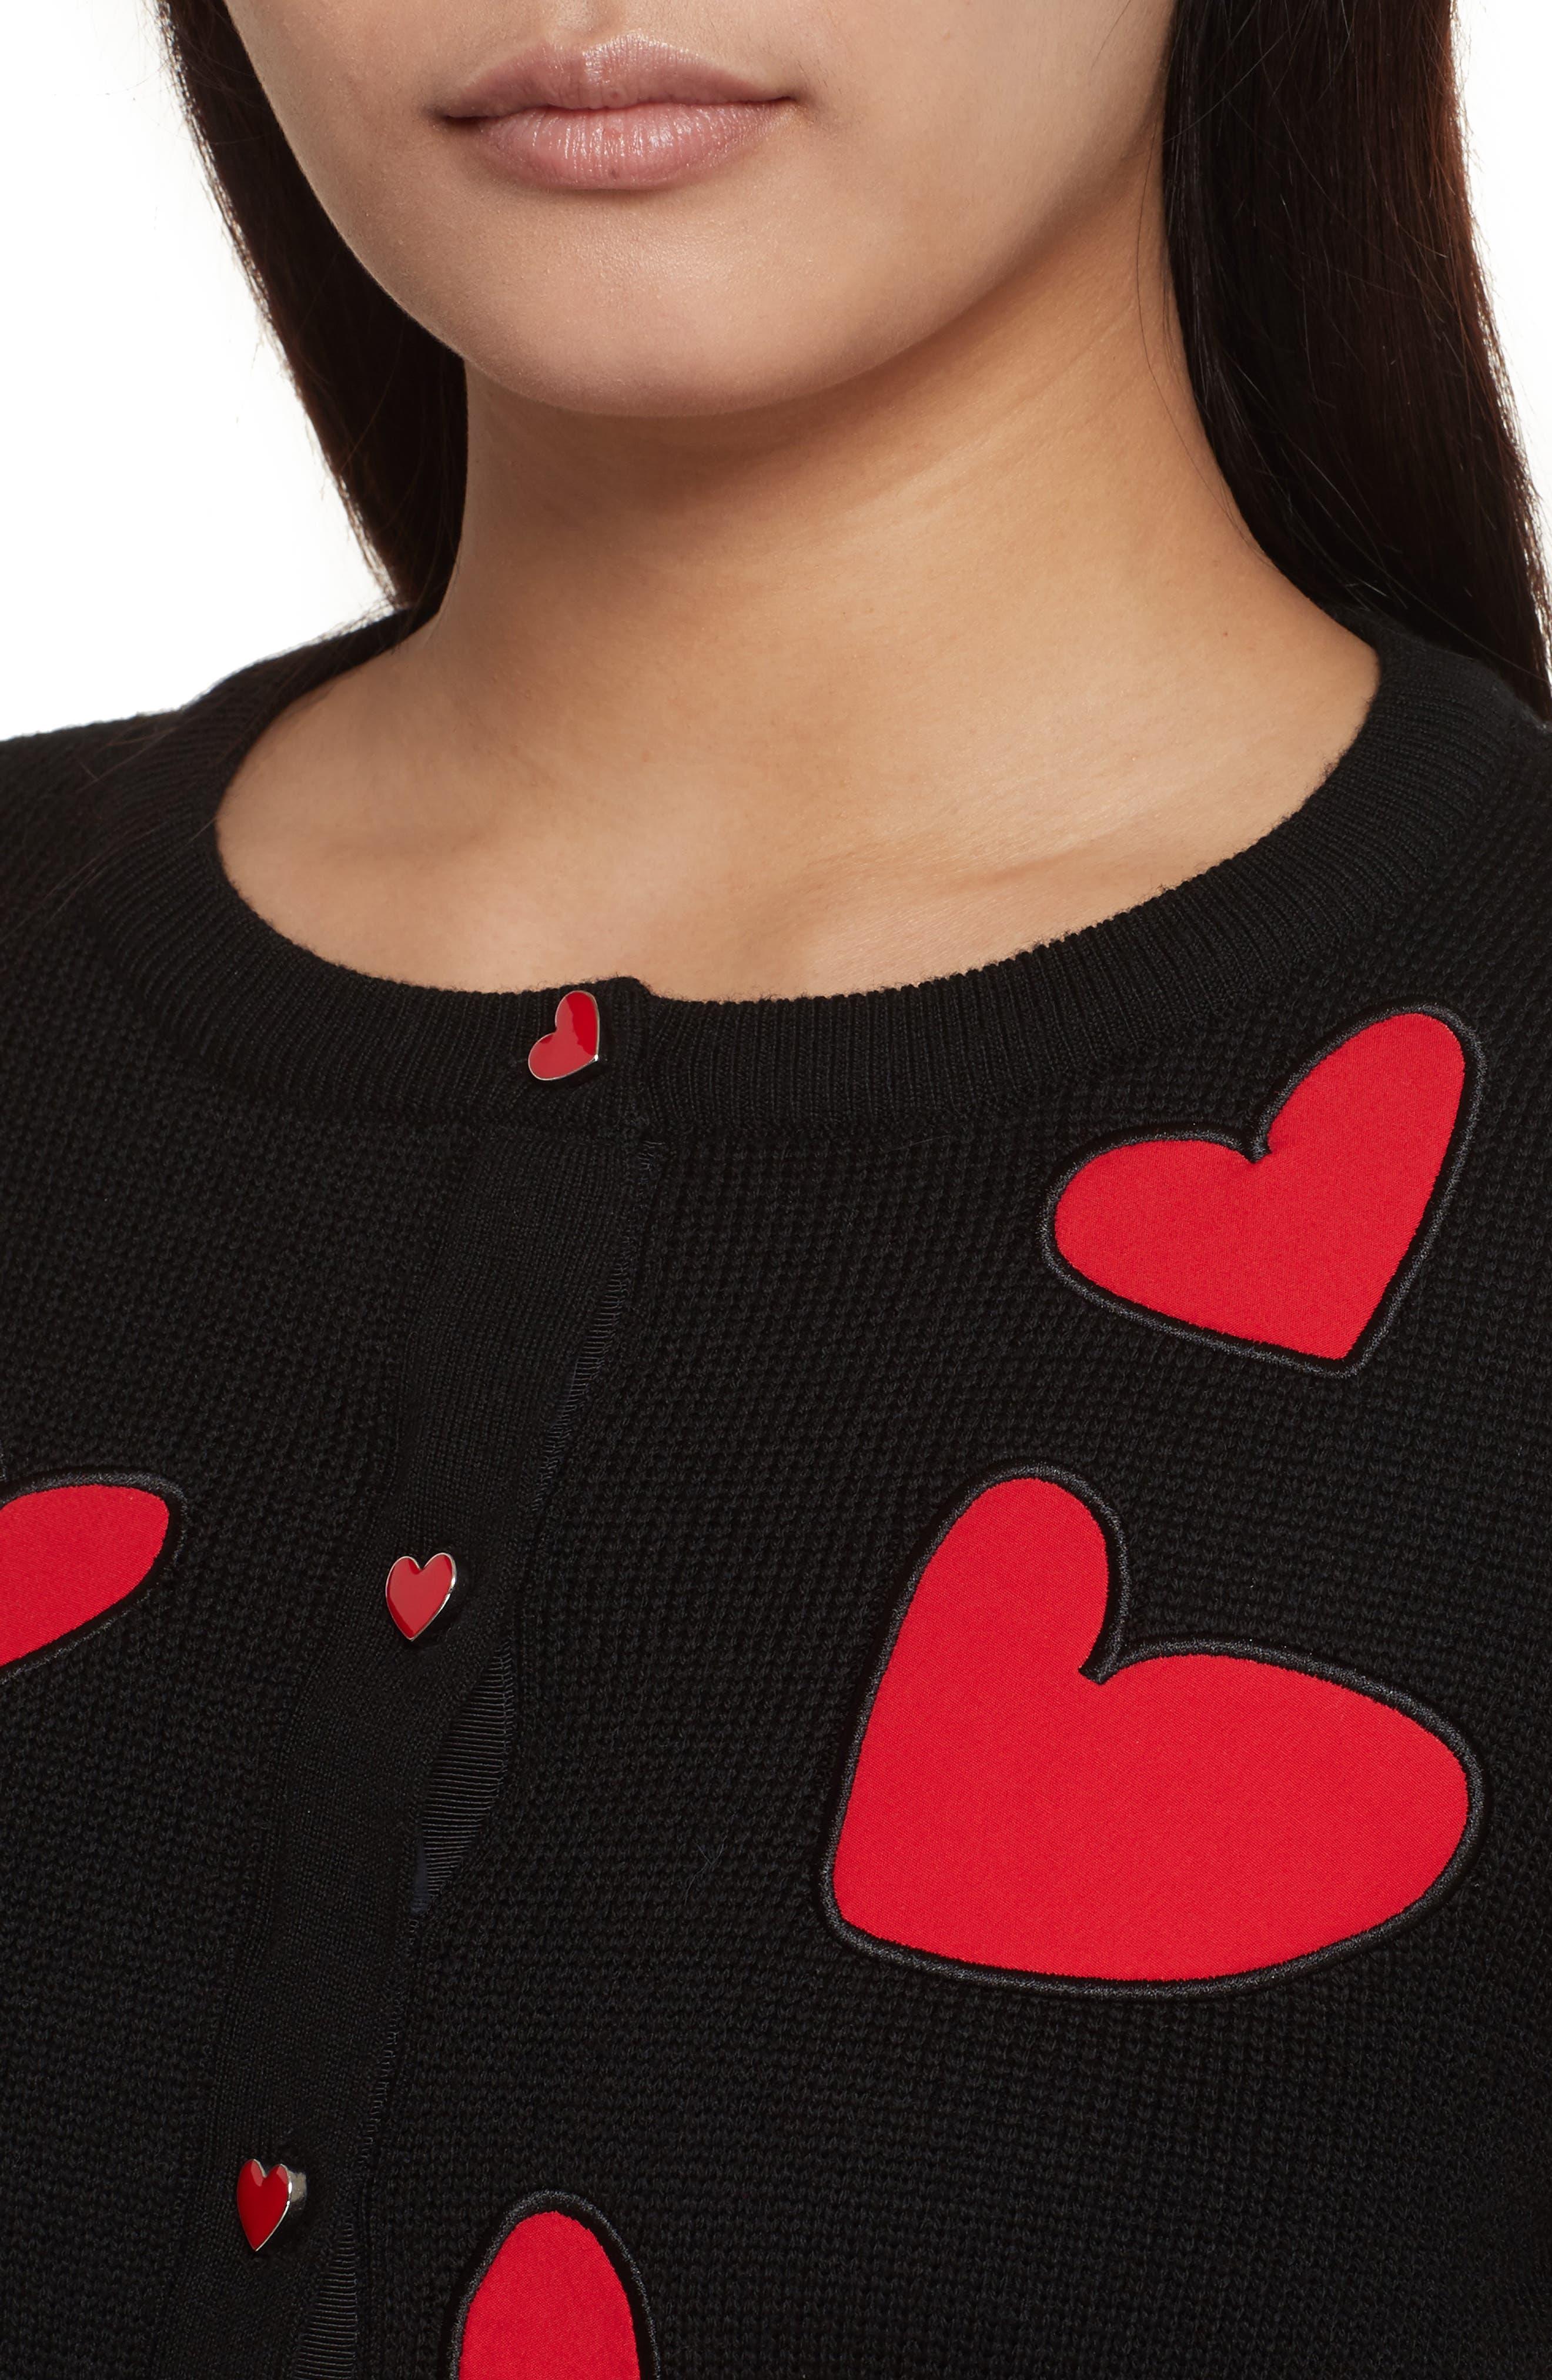 Ruthy Heart Appliqué Cardigan,                             Alternate thumbnail 4, color,                             Black/ Apple